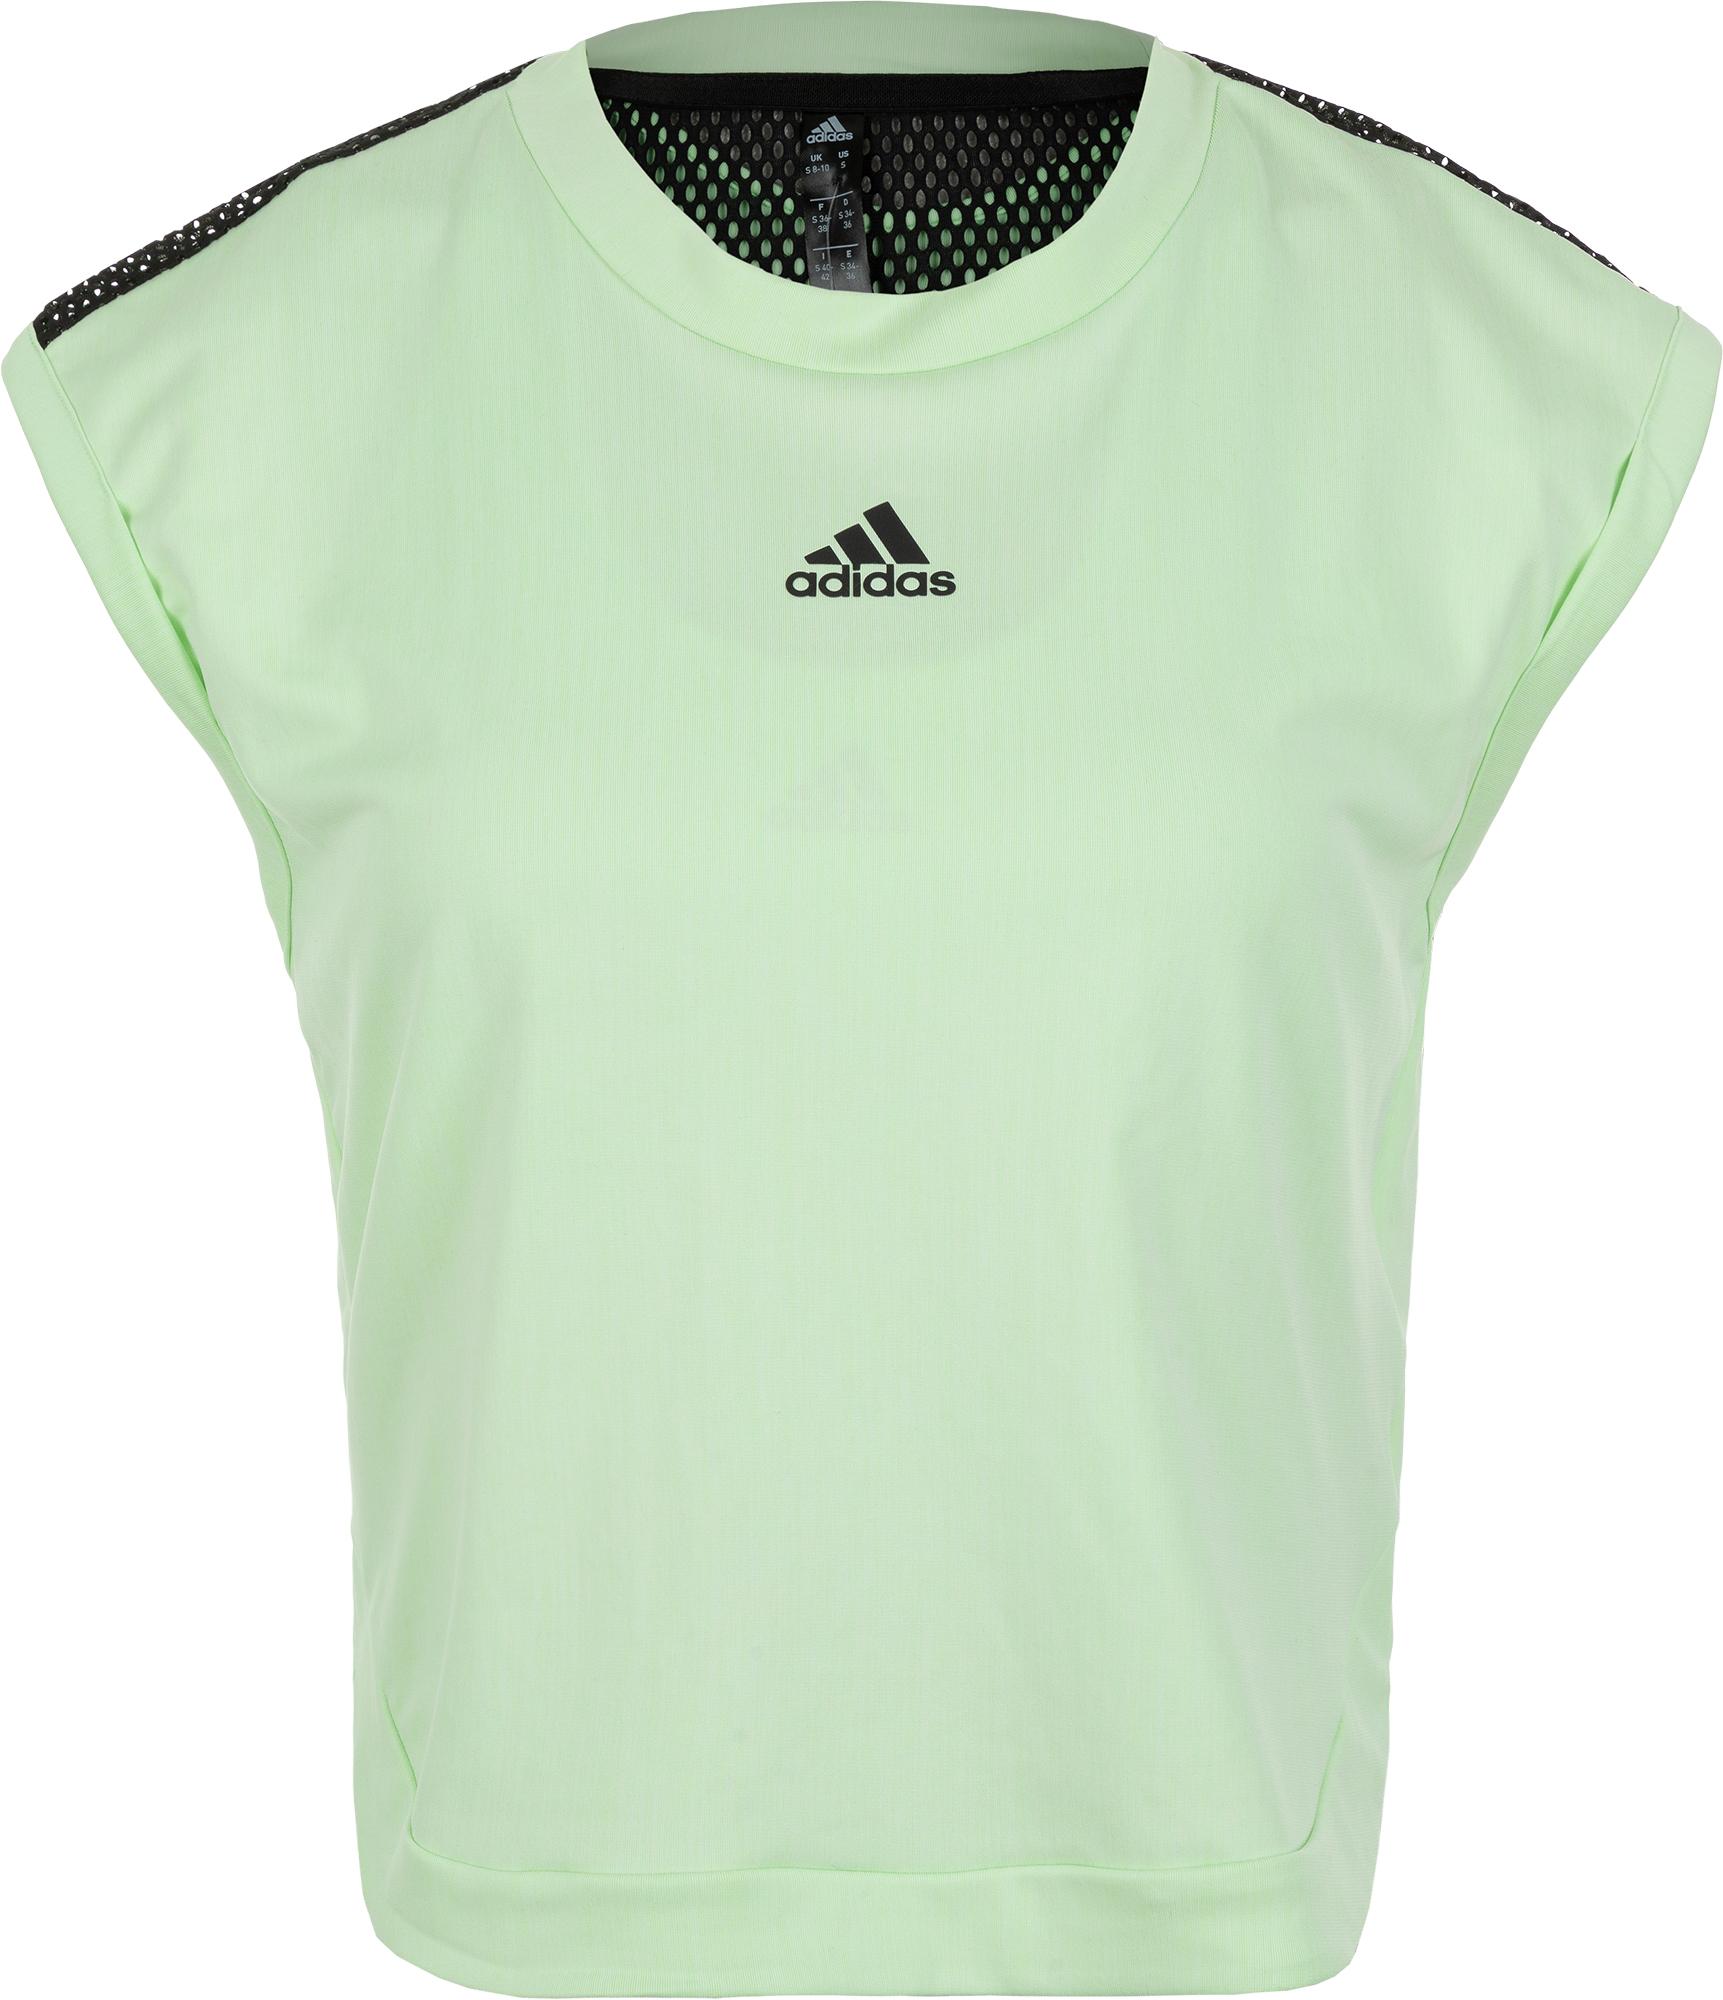 Adidas Футболка женская Adidas New York, размер 46-48 цена